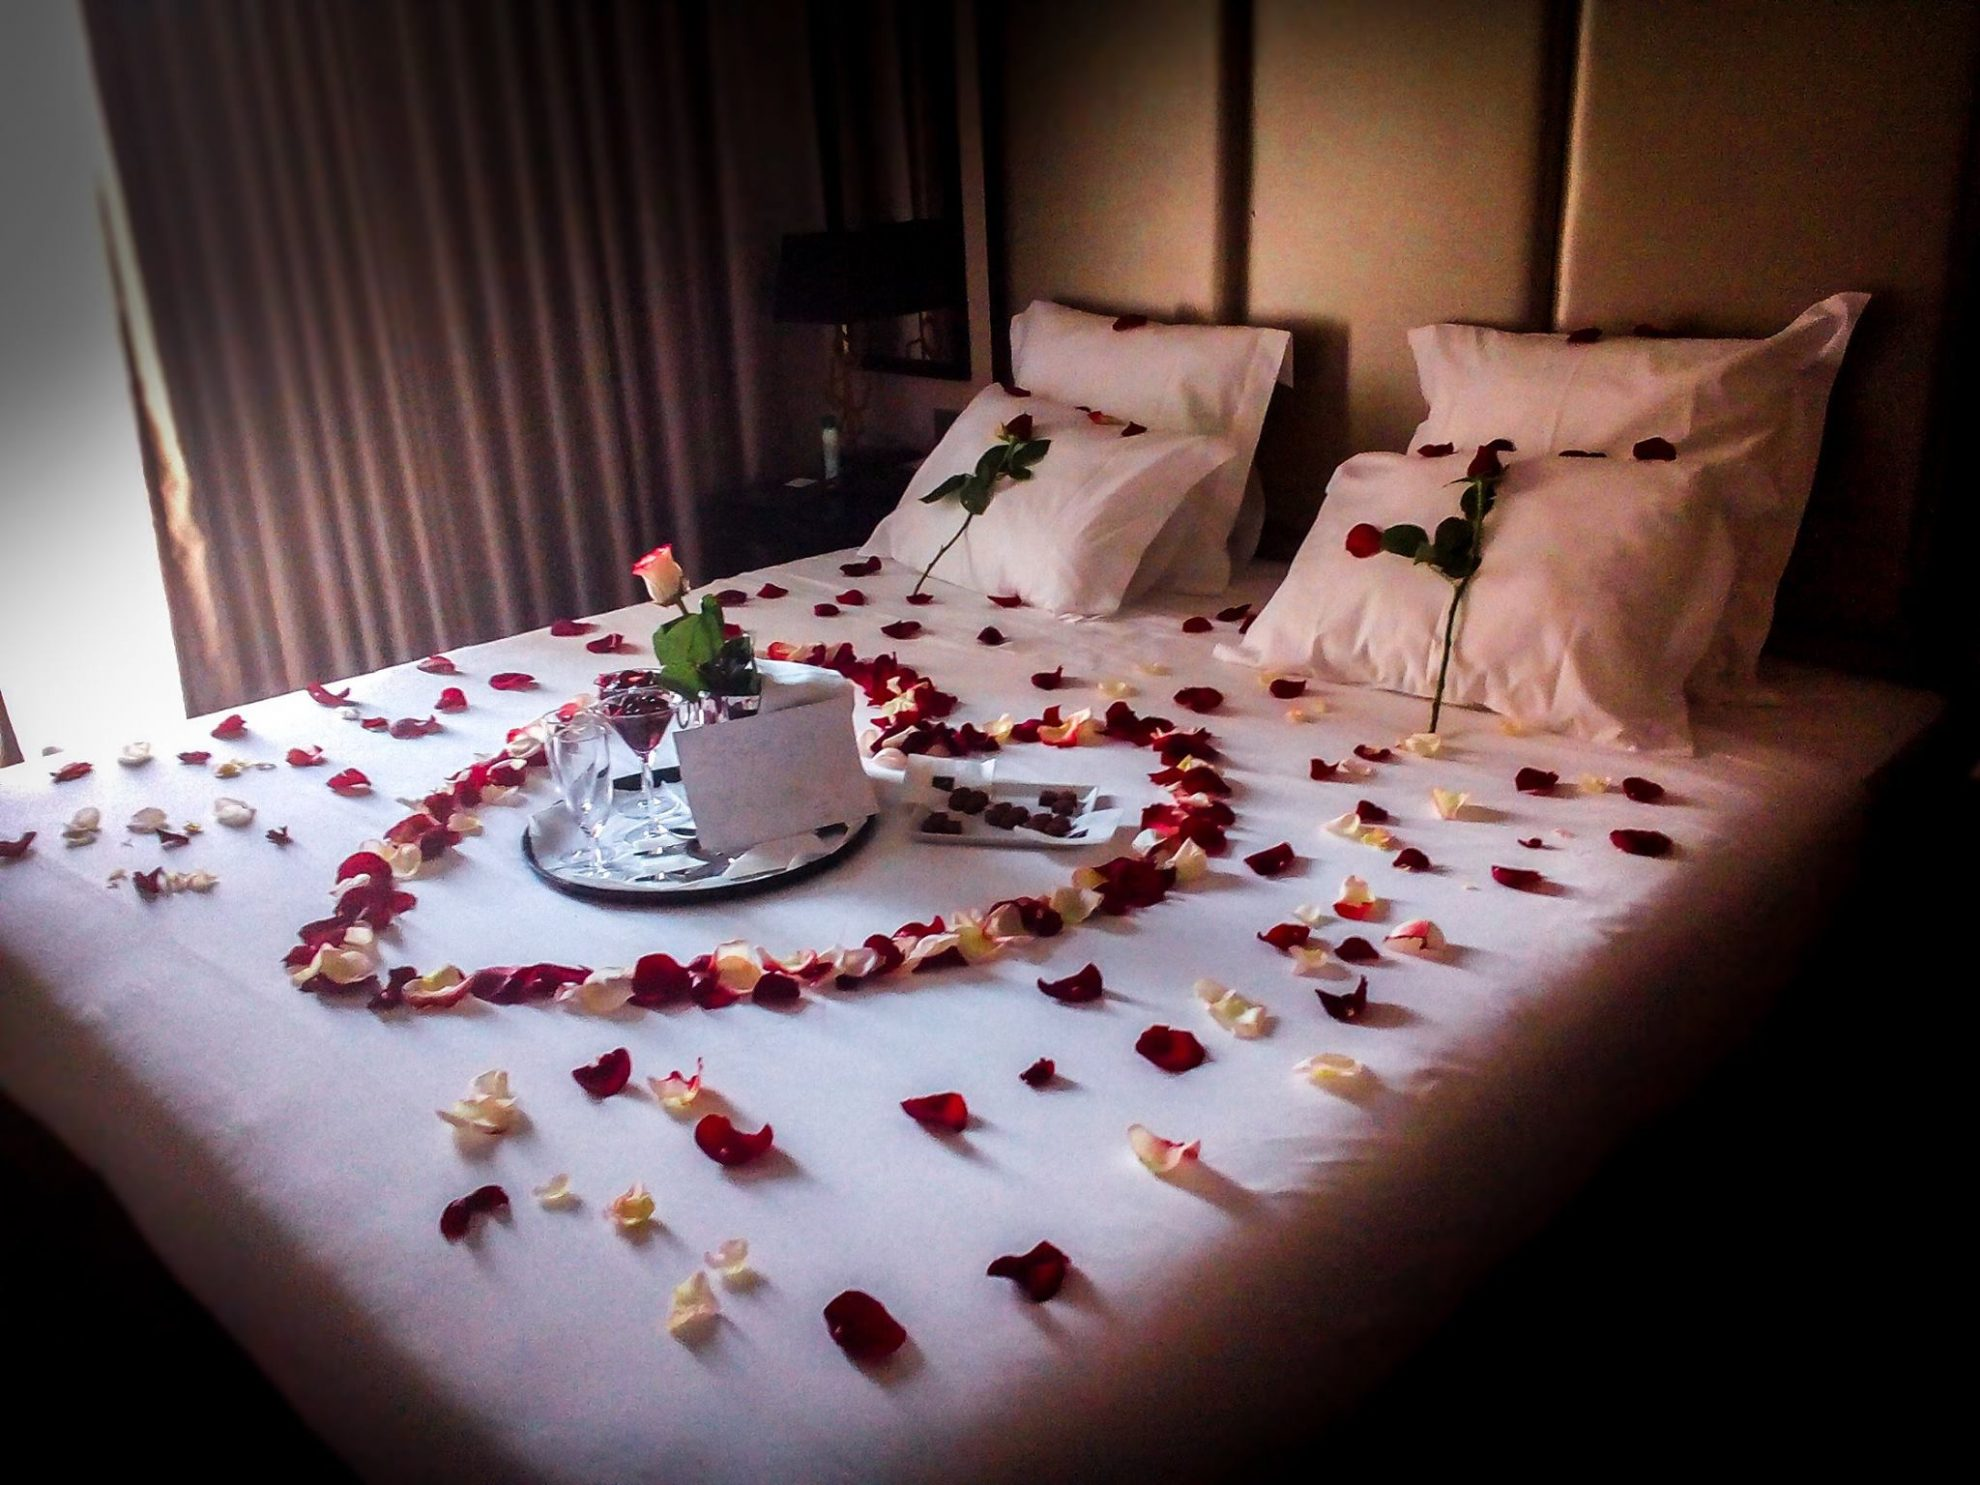 czar lisbon hotel chambre decoree lisbonne week end et voyage lisbonne. Black Bedroom Furniture Sets. Home Design Ideas